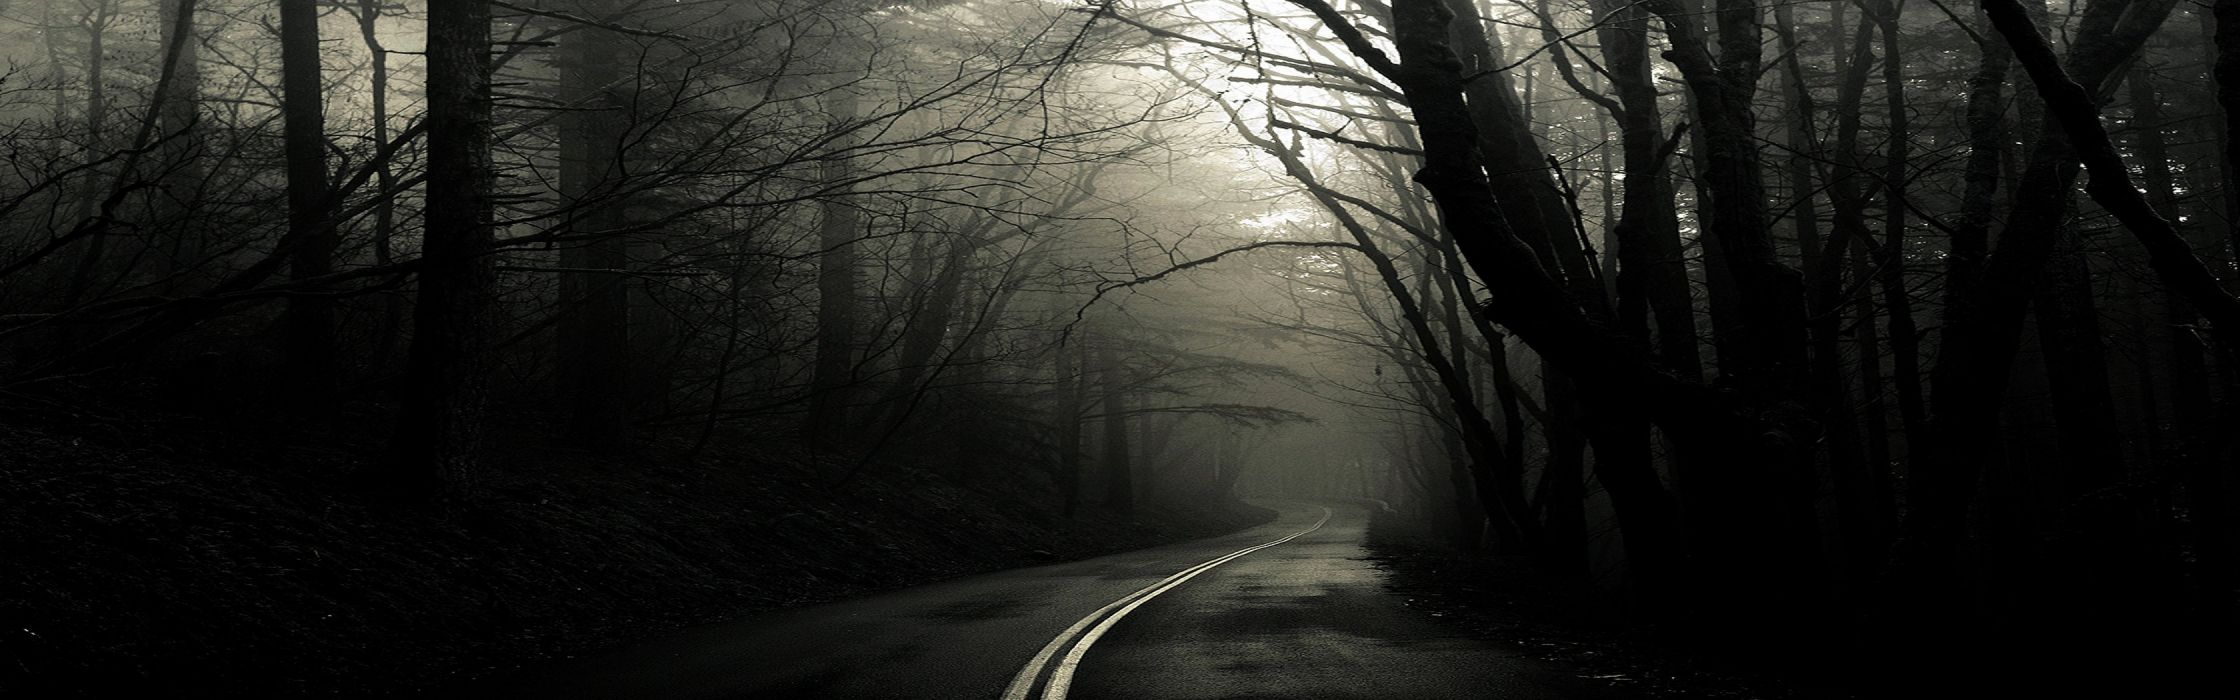 forests fog roads Greg Martin wallpaper